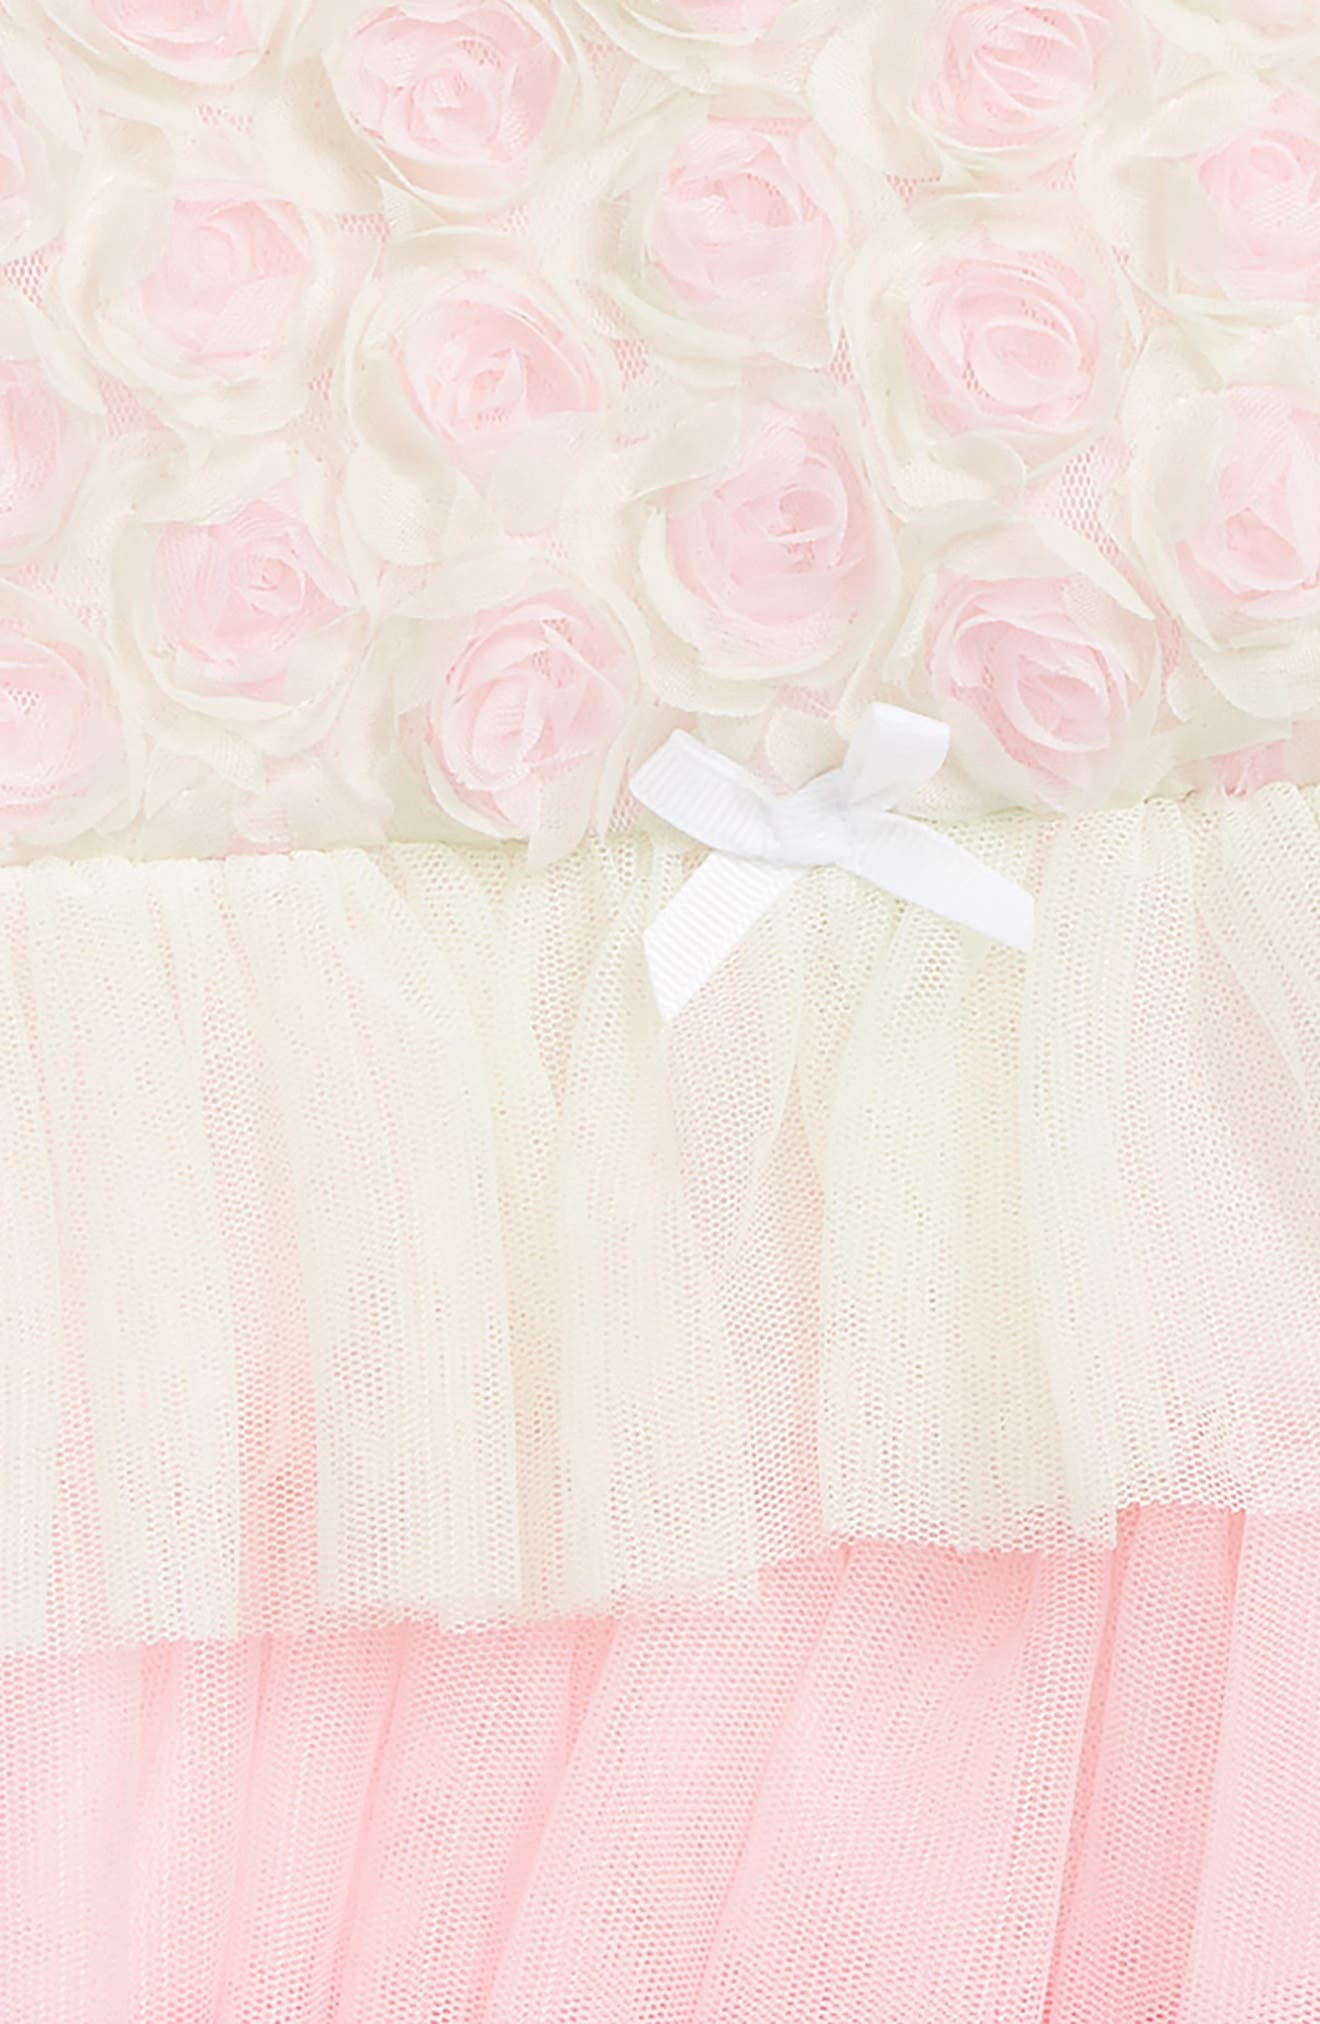 Rosette Popover Bodysuit & Head Wrap Set,                             Alternate thumbnail 2, color,                             Pink Multi